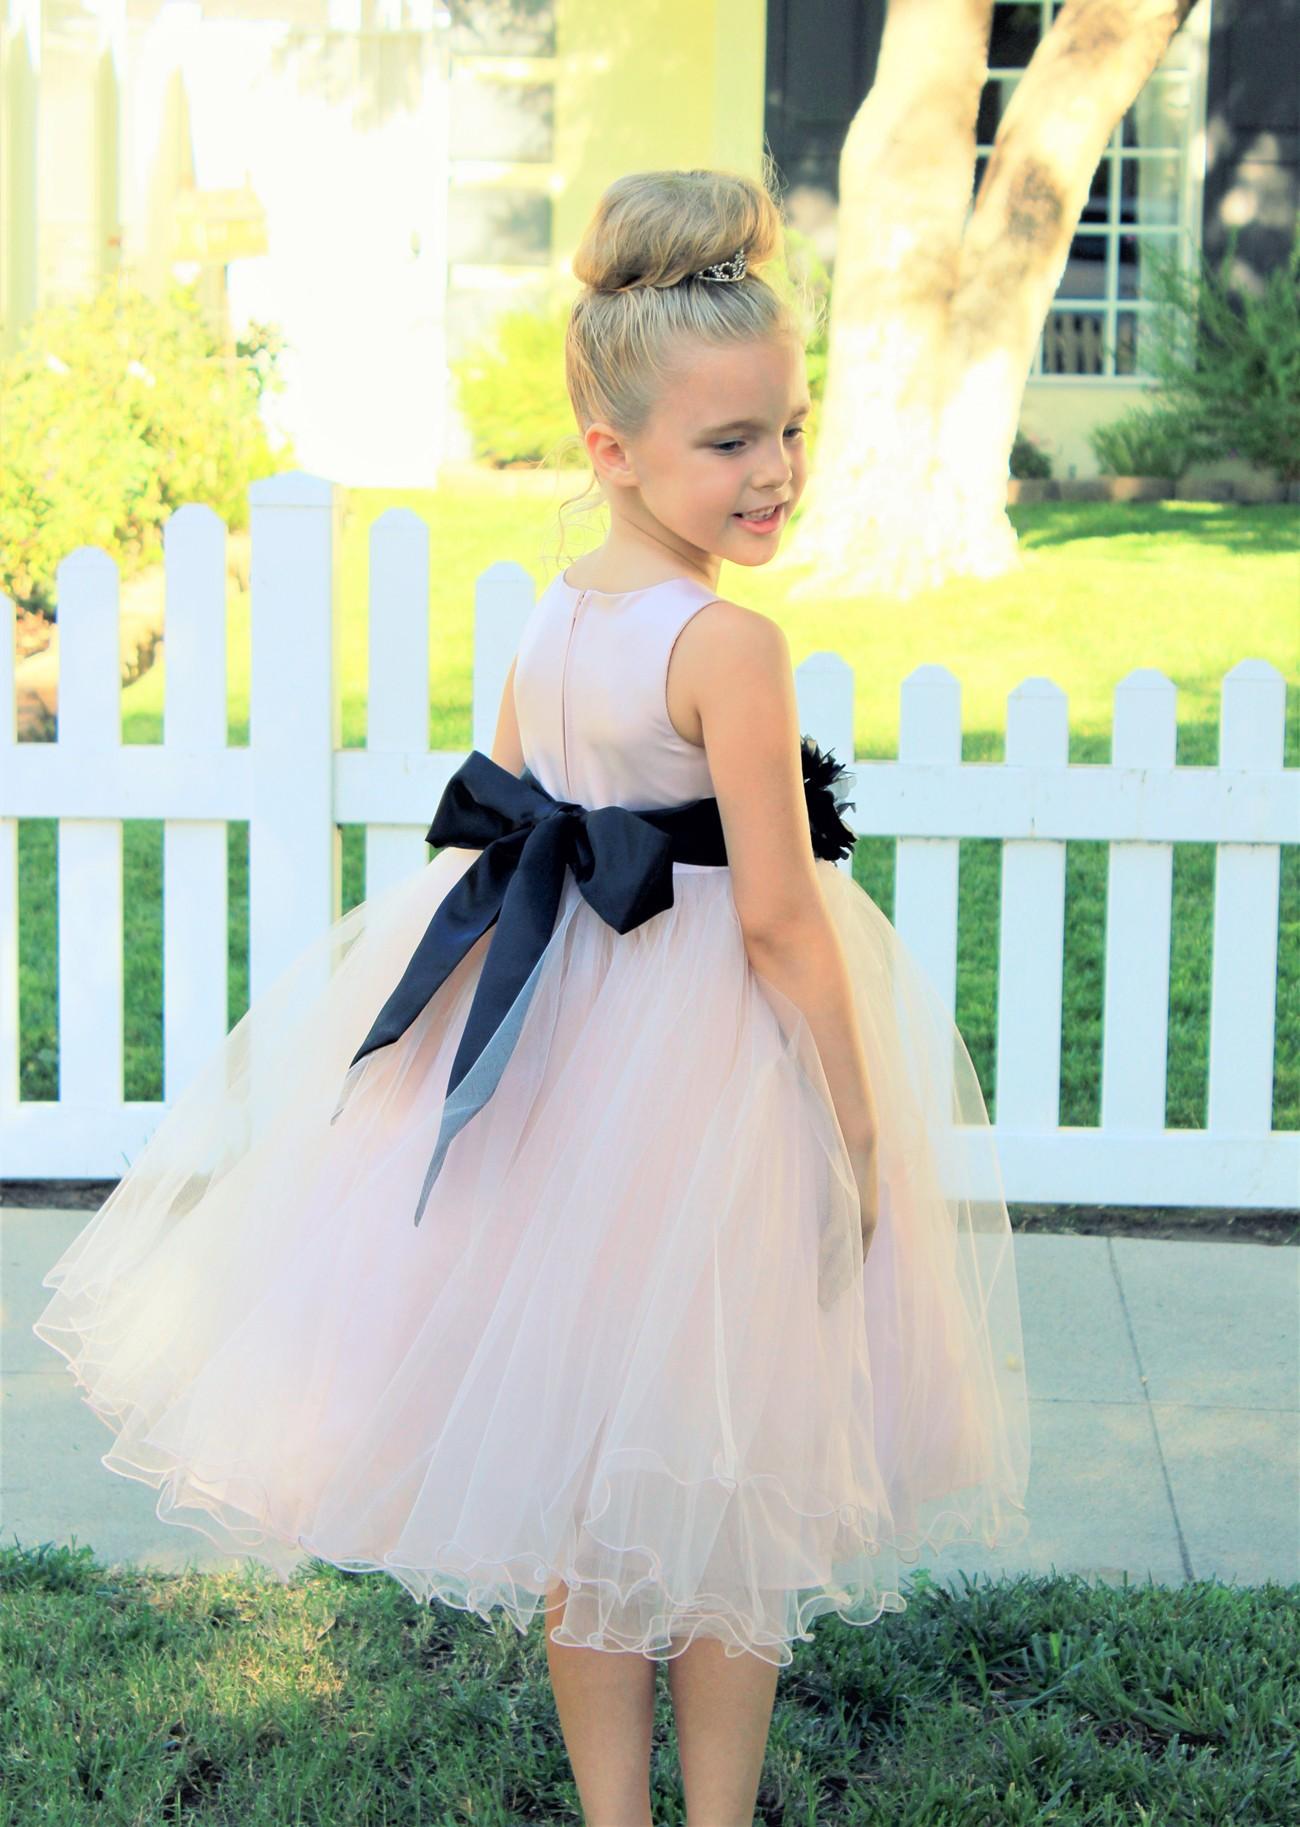 Blush Pink / Black Tulle Rattail Edge Flower Girl Dress Pageant Recital 829S